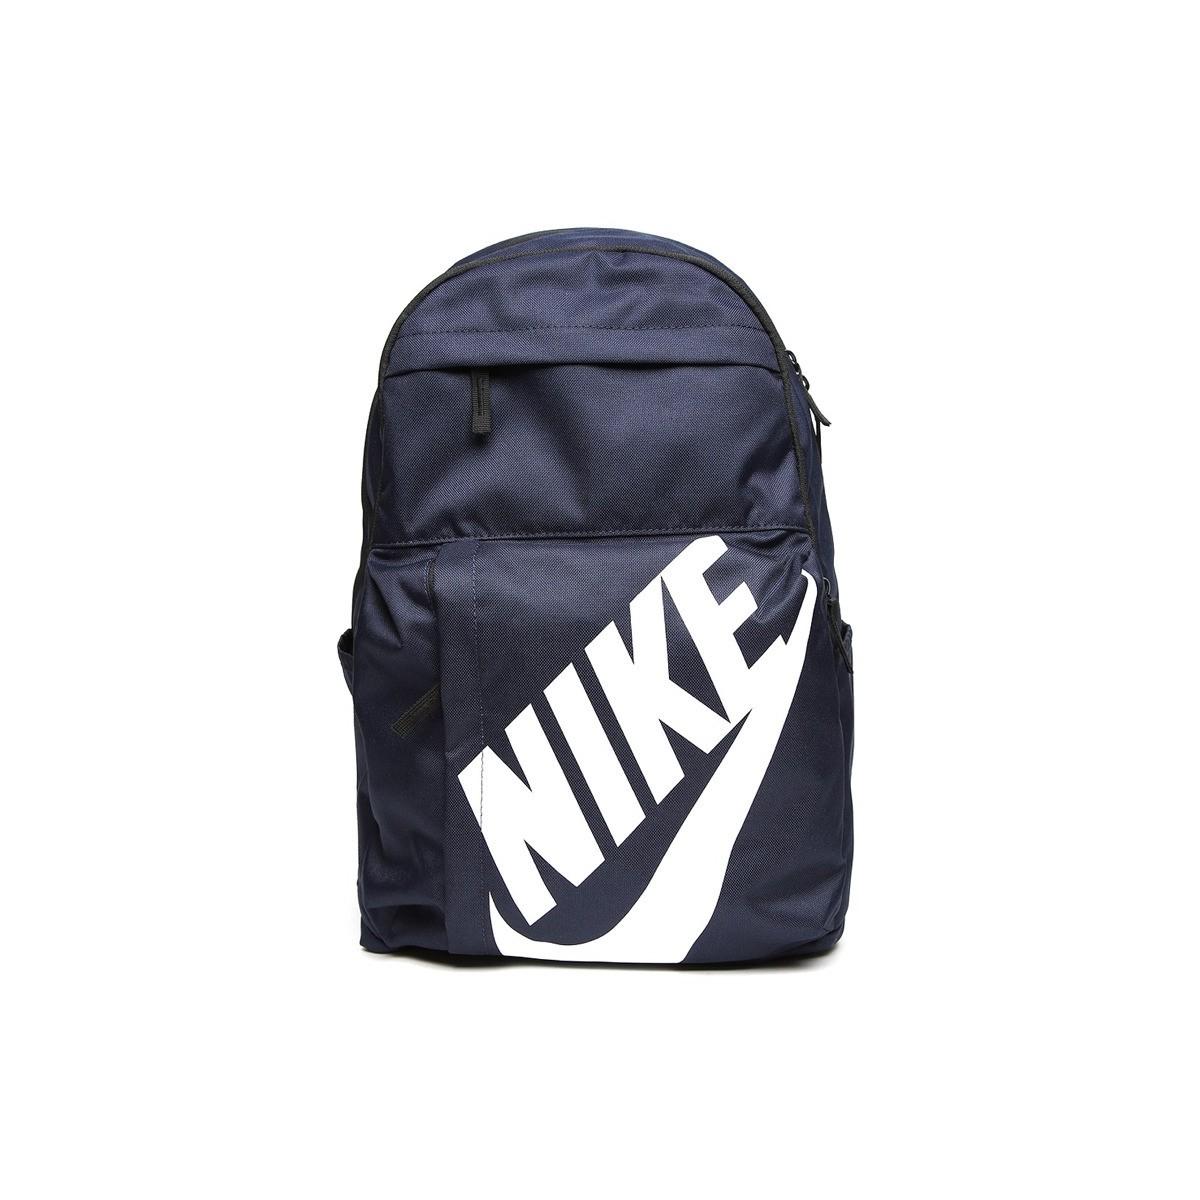 fad68d430d4 MOCHILA NIKE AZUL   Mochila Nike Elemental Logo Azul Marino mejor ...